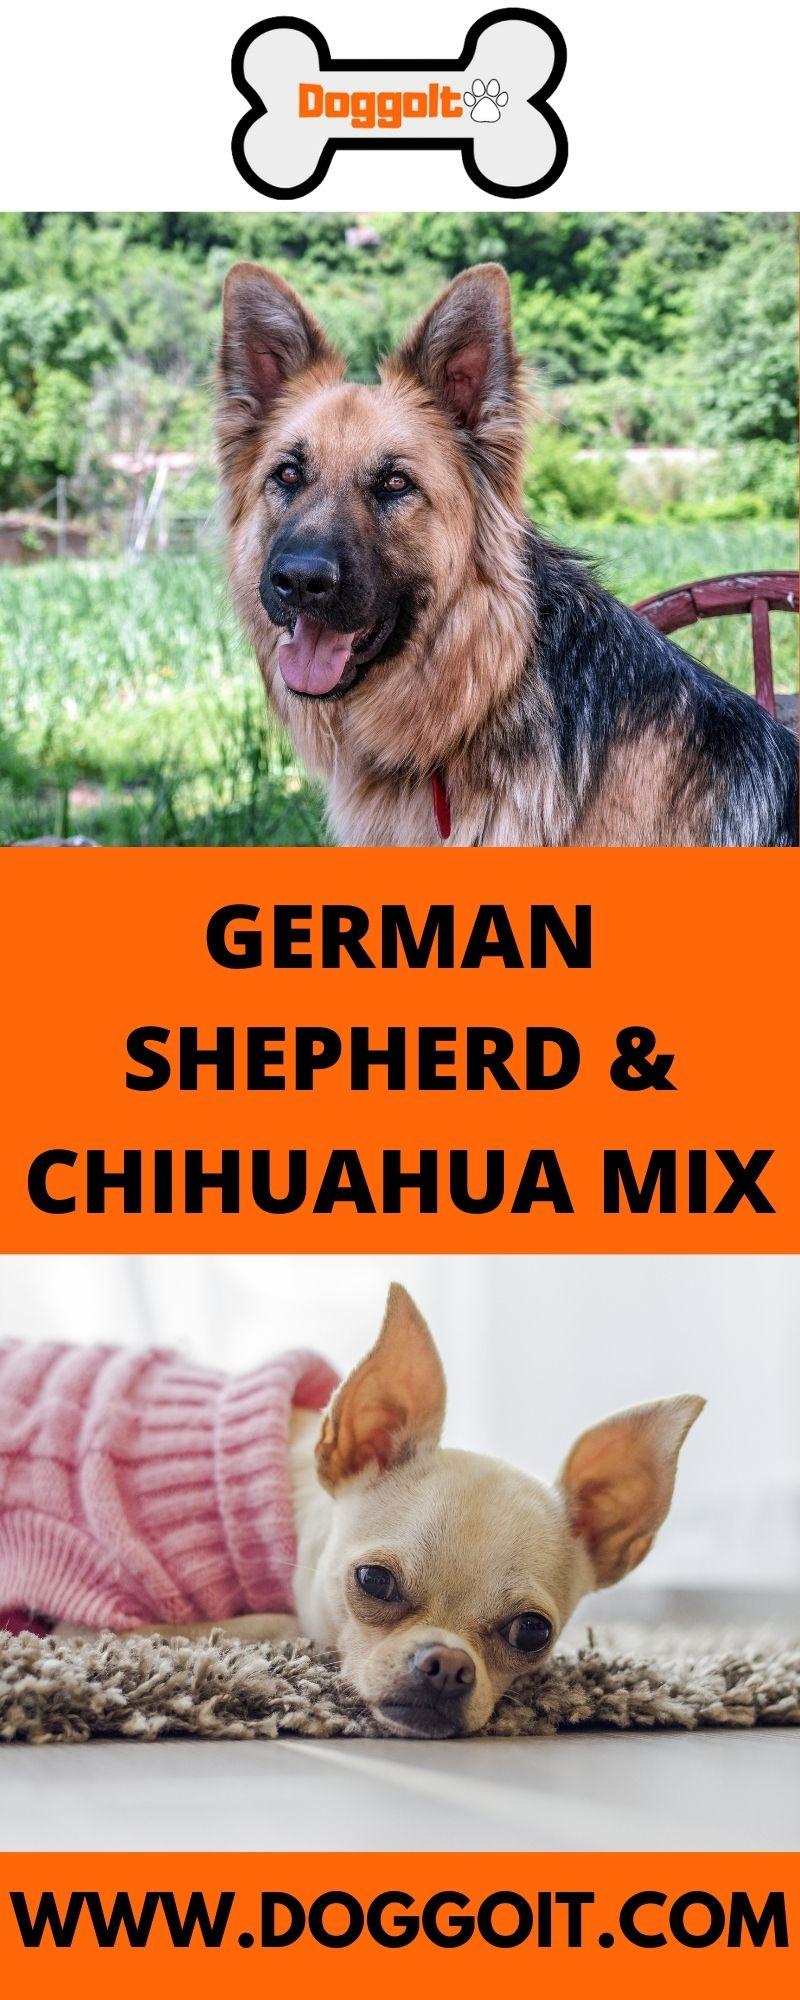 German Shepherd and Chihuahua Mix Dog